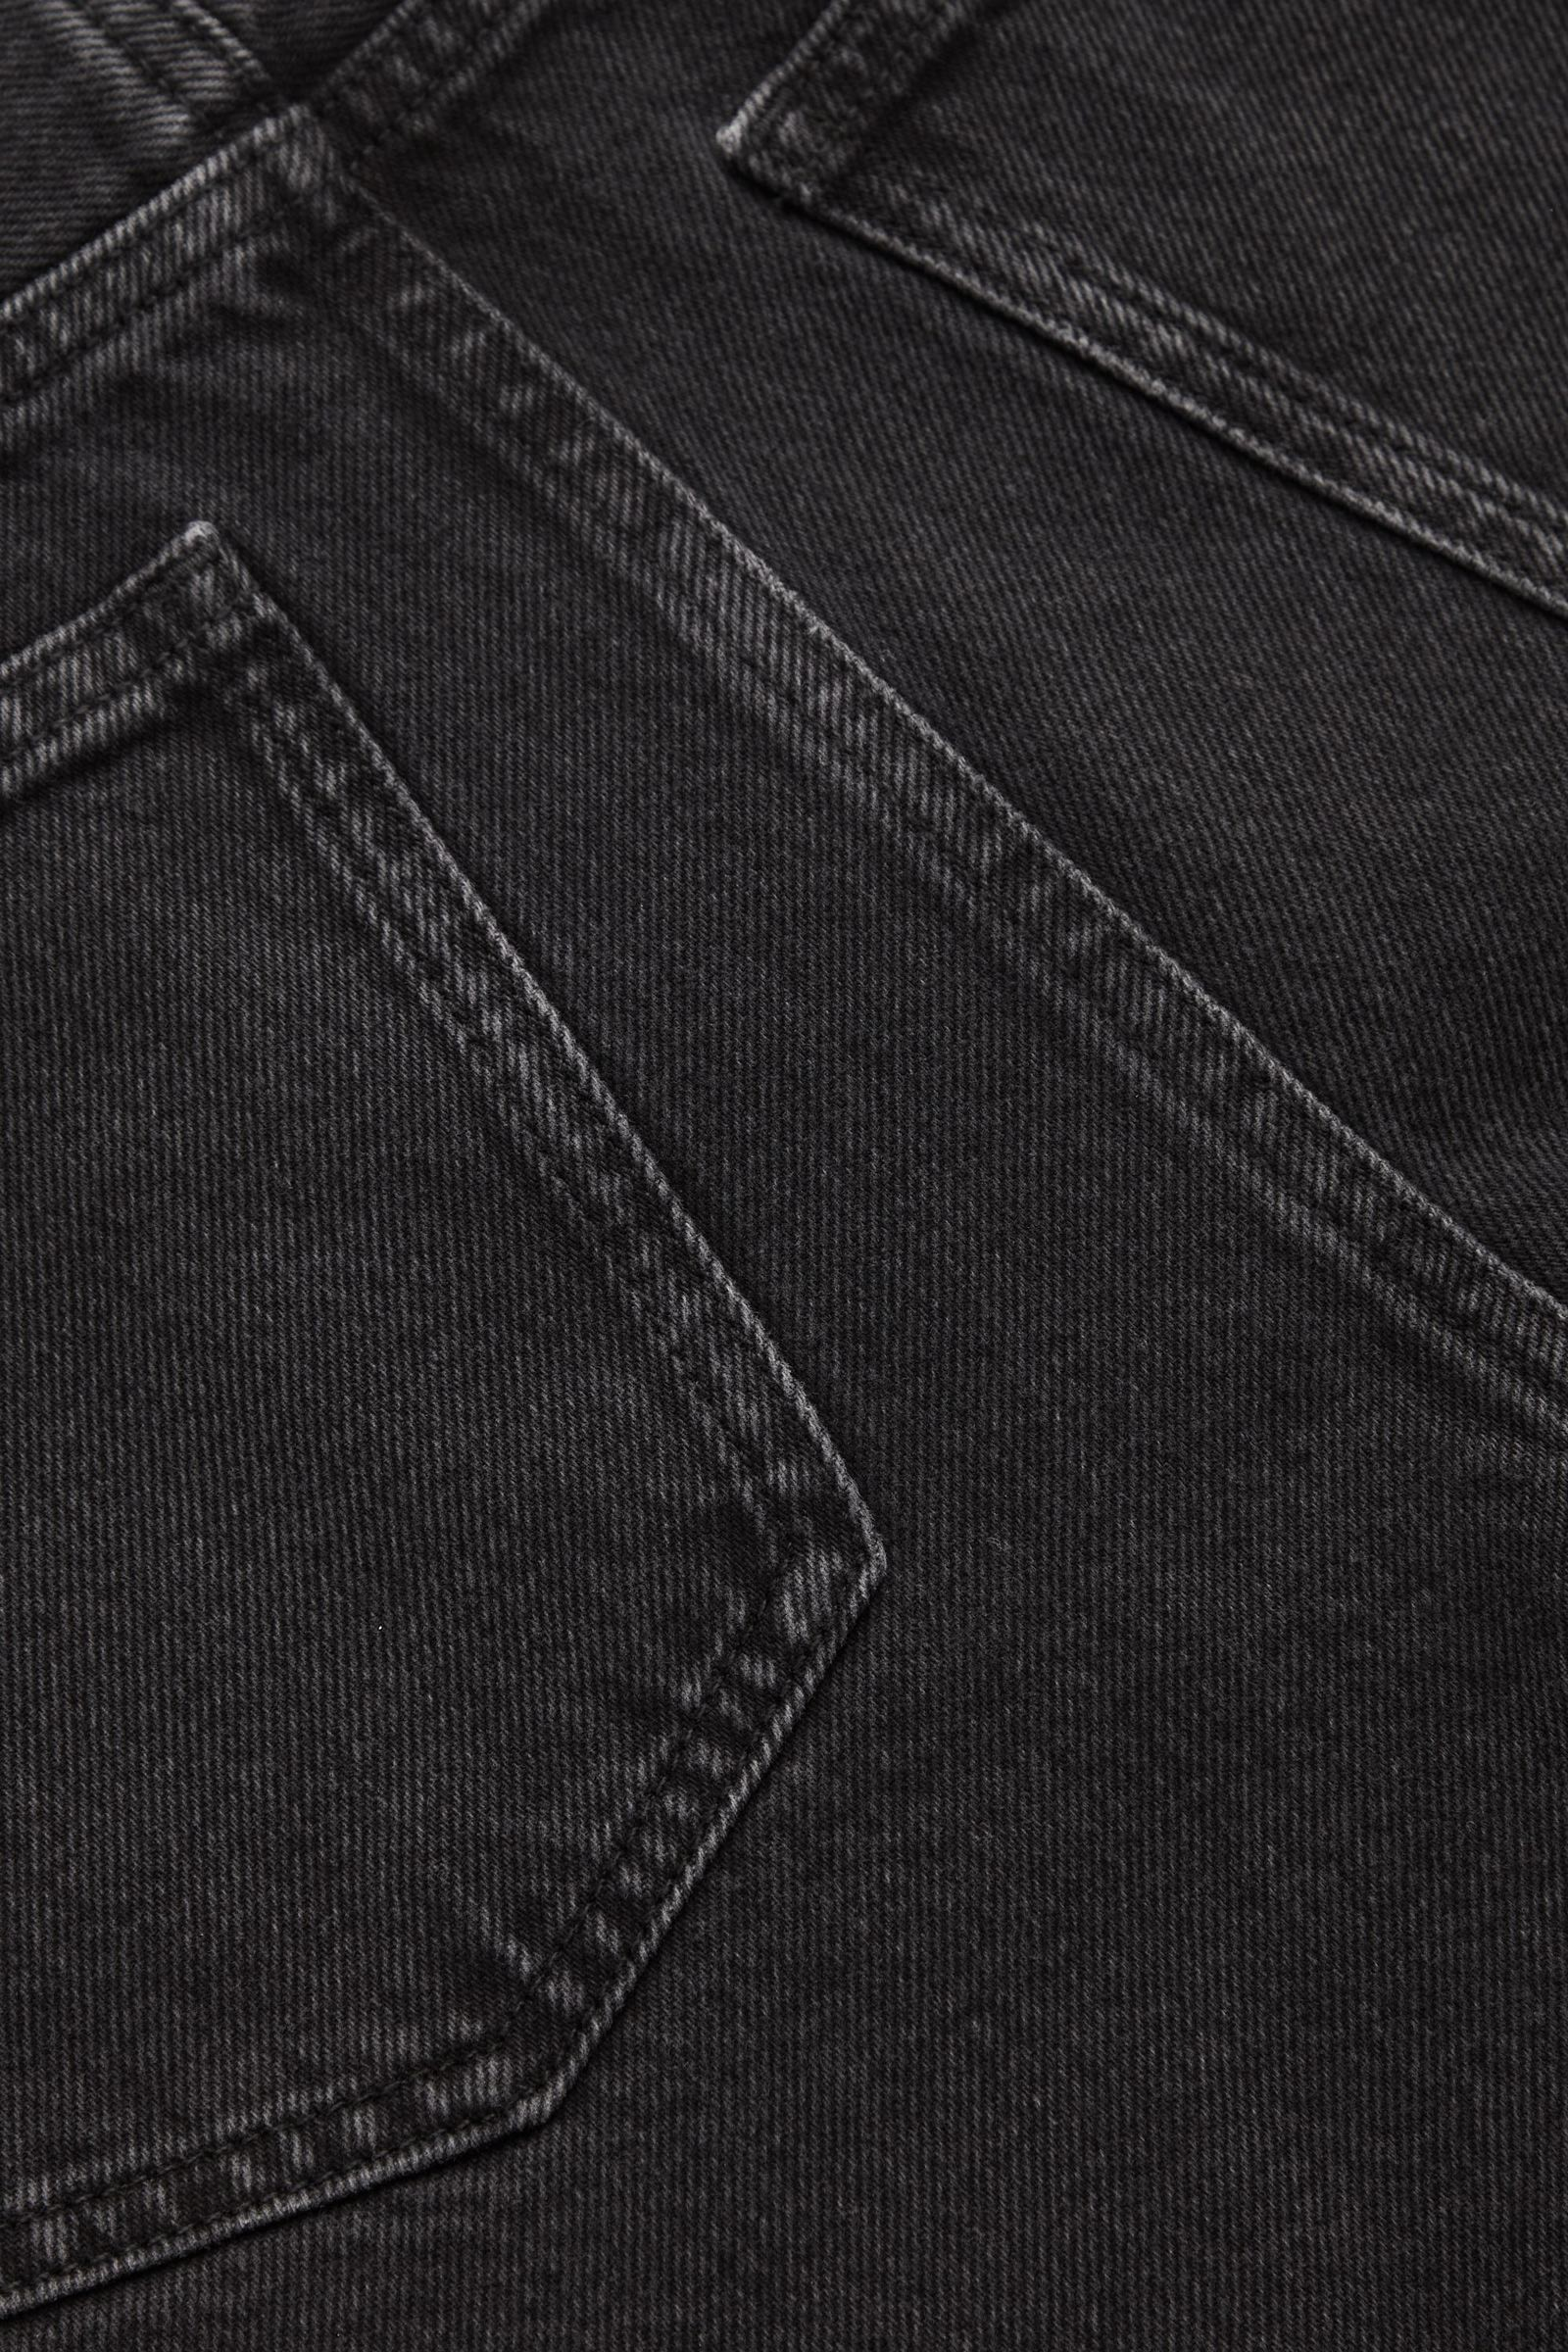 COS 릴랙스드 핏 데님 쇼츠의 다크 그레이컬러 Detail입니다.